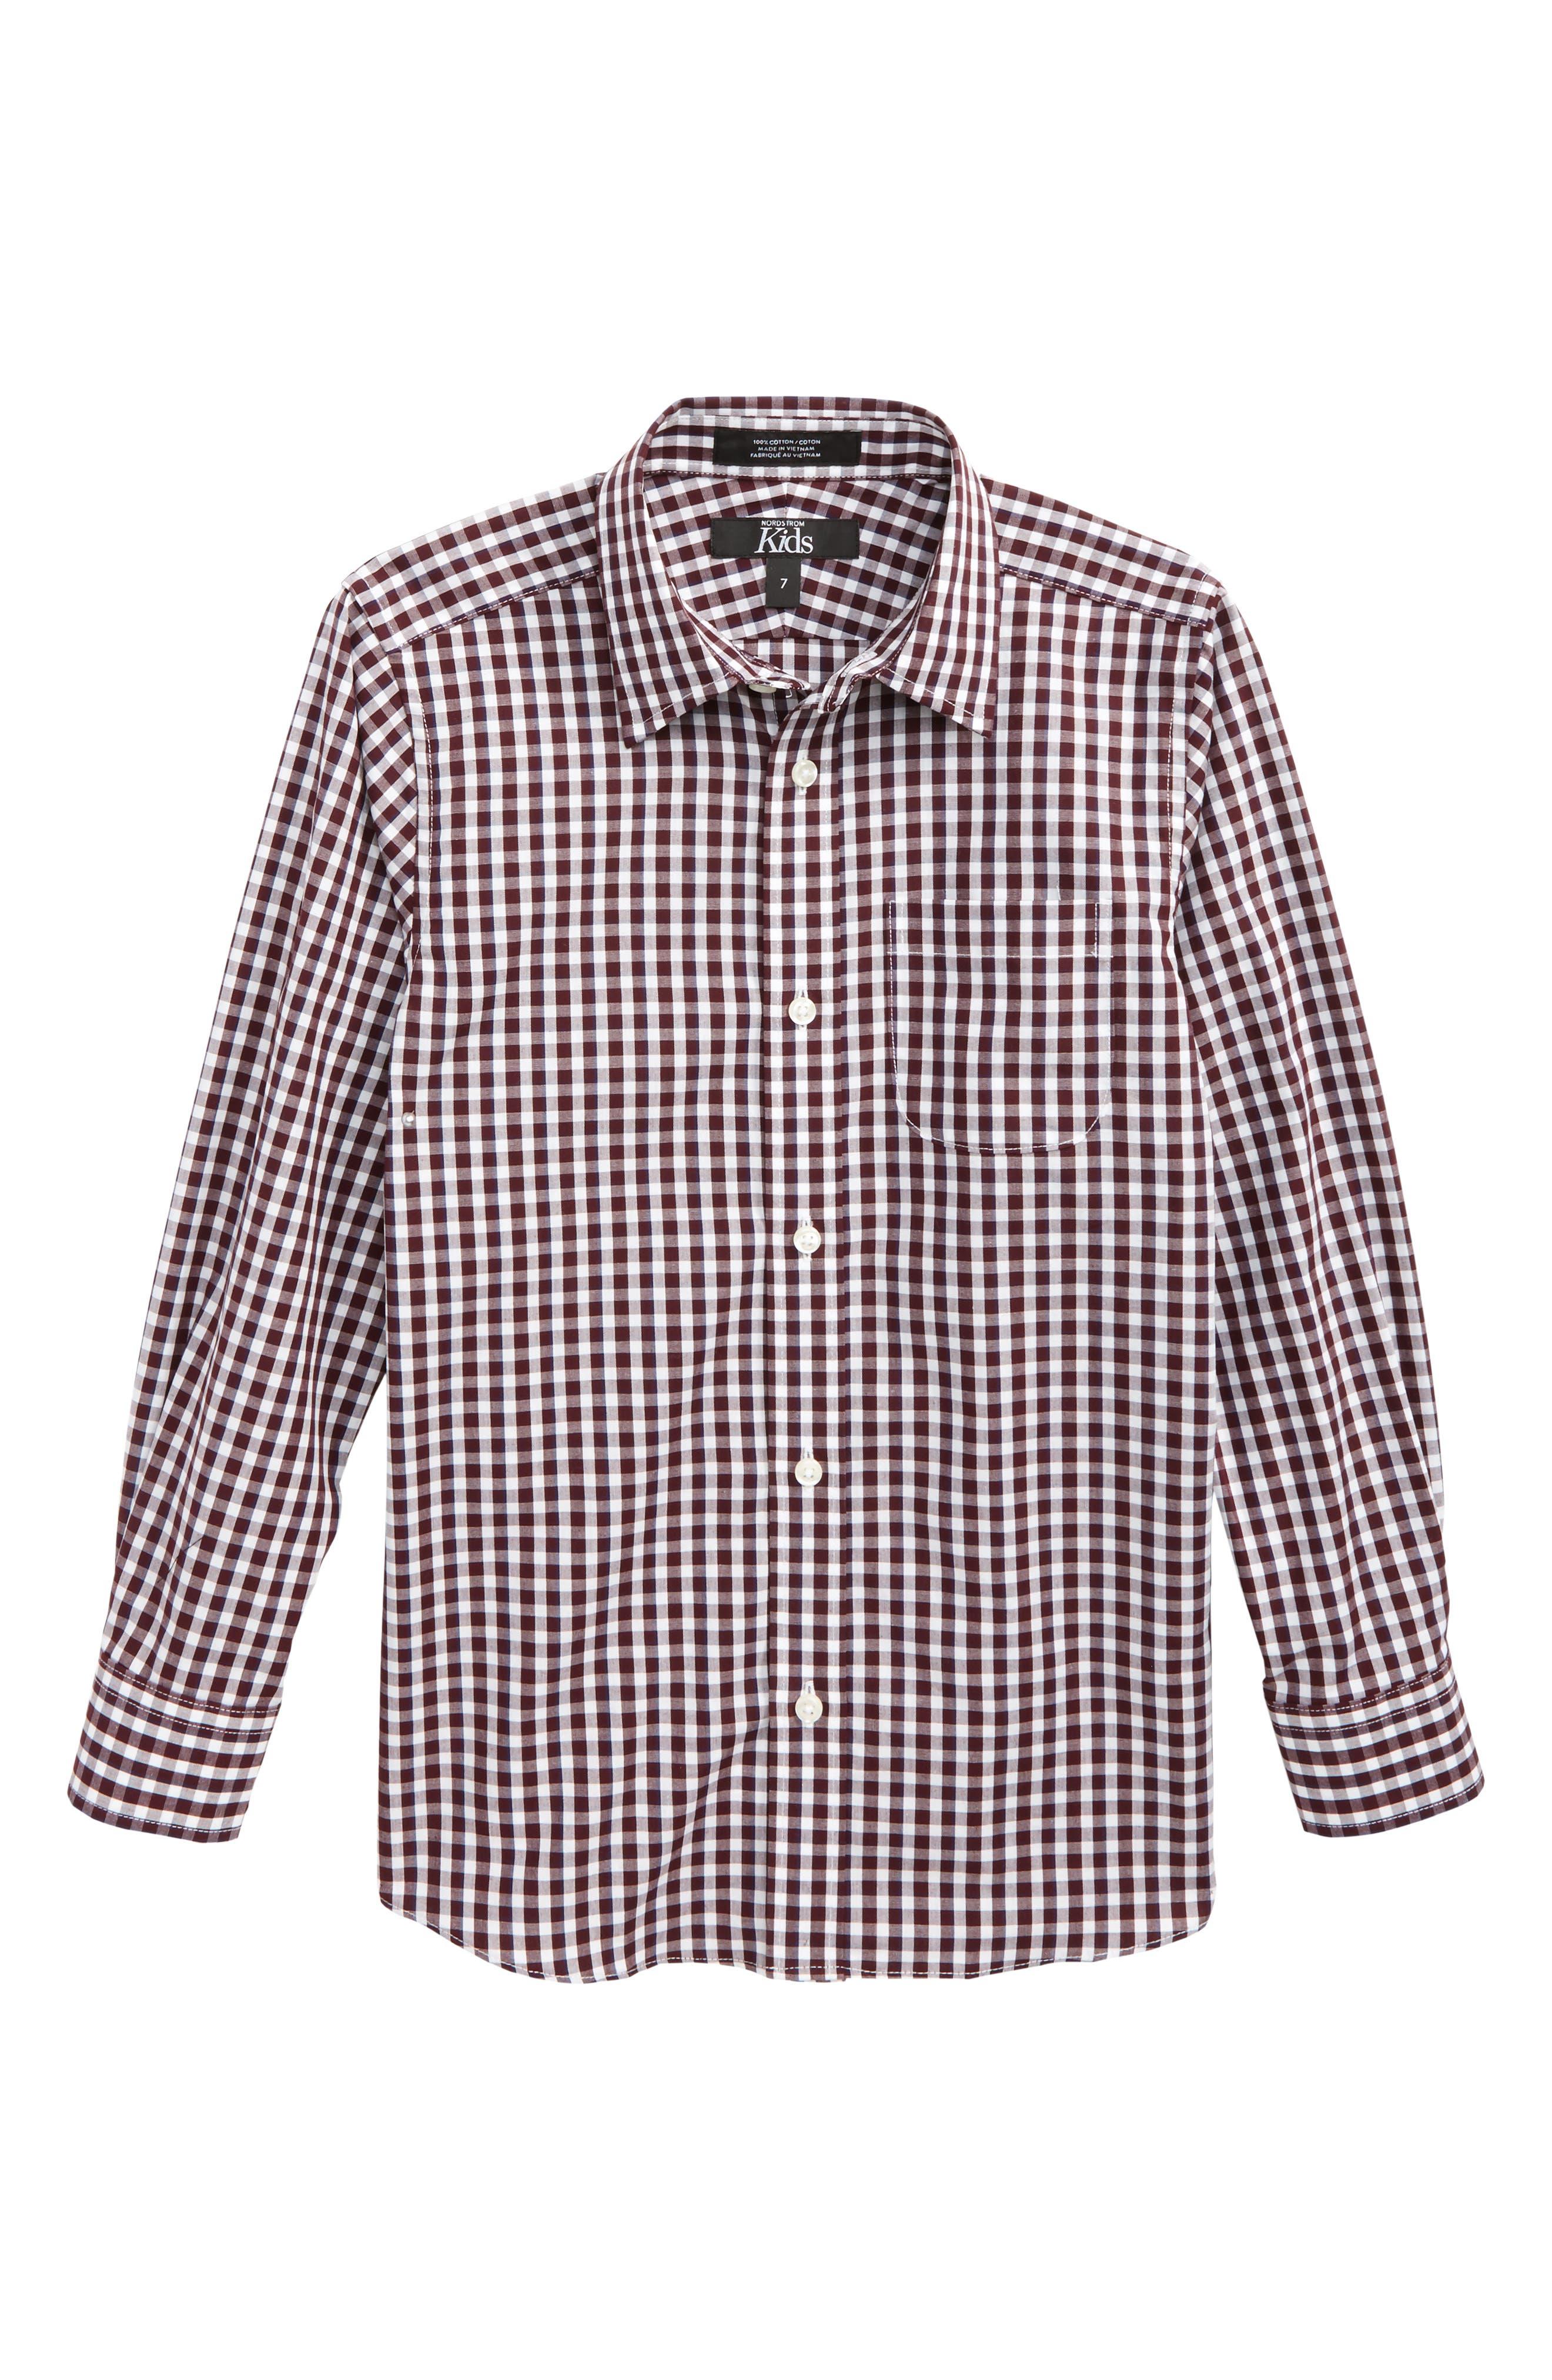 Alternate Image 1 Selected - Nordstrom Check Dress Shirt (Toddler Boys, Little Boys & Big Boys)